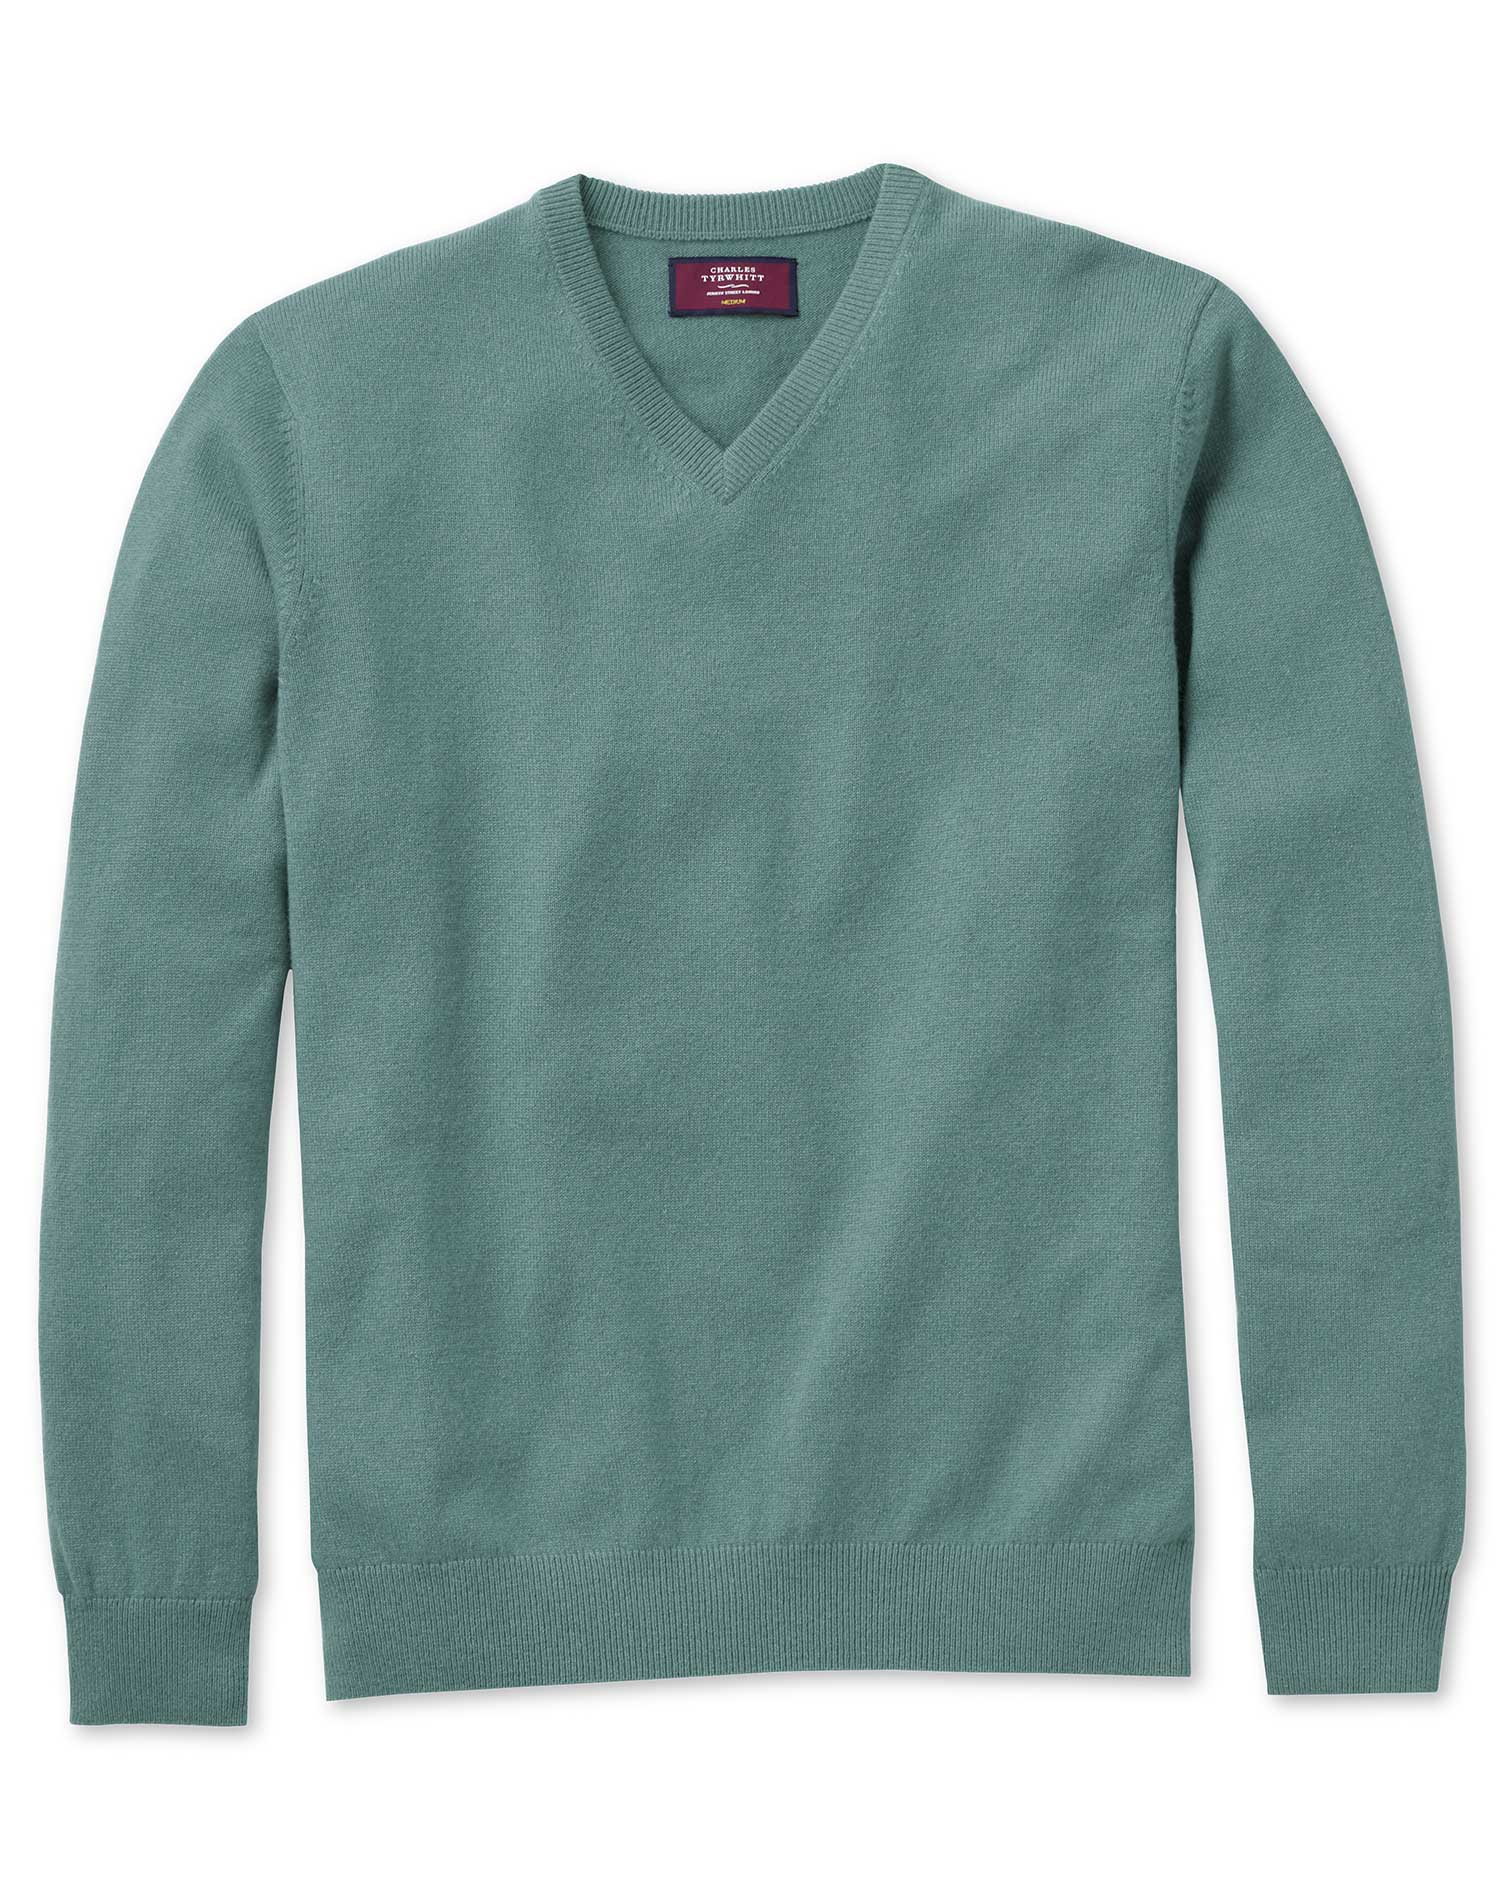 Light Green Cashmere V-Neck Jumper Size XL by Charles Tyrwhitt